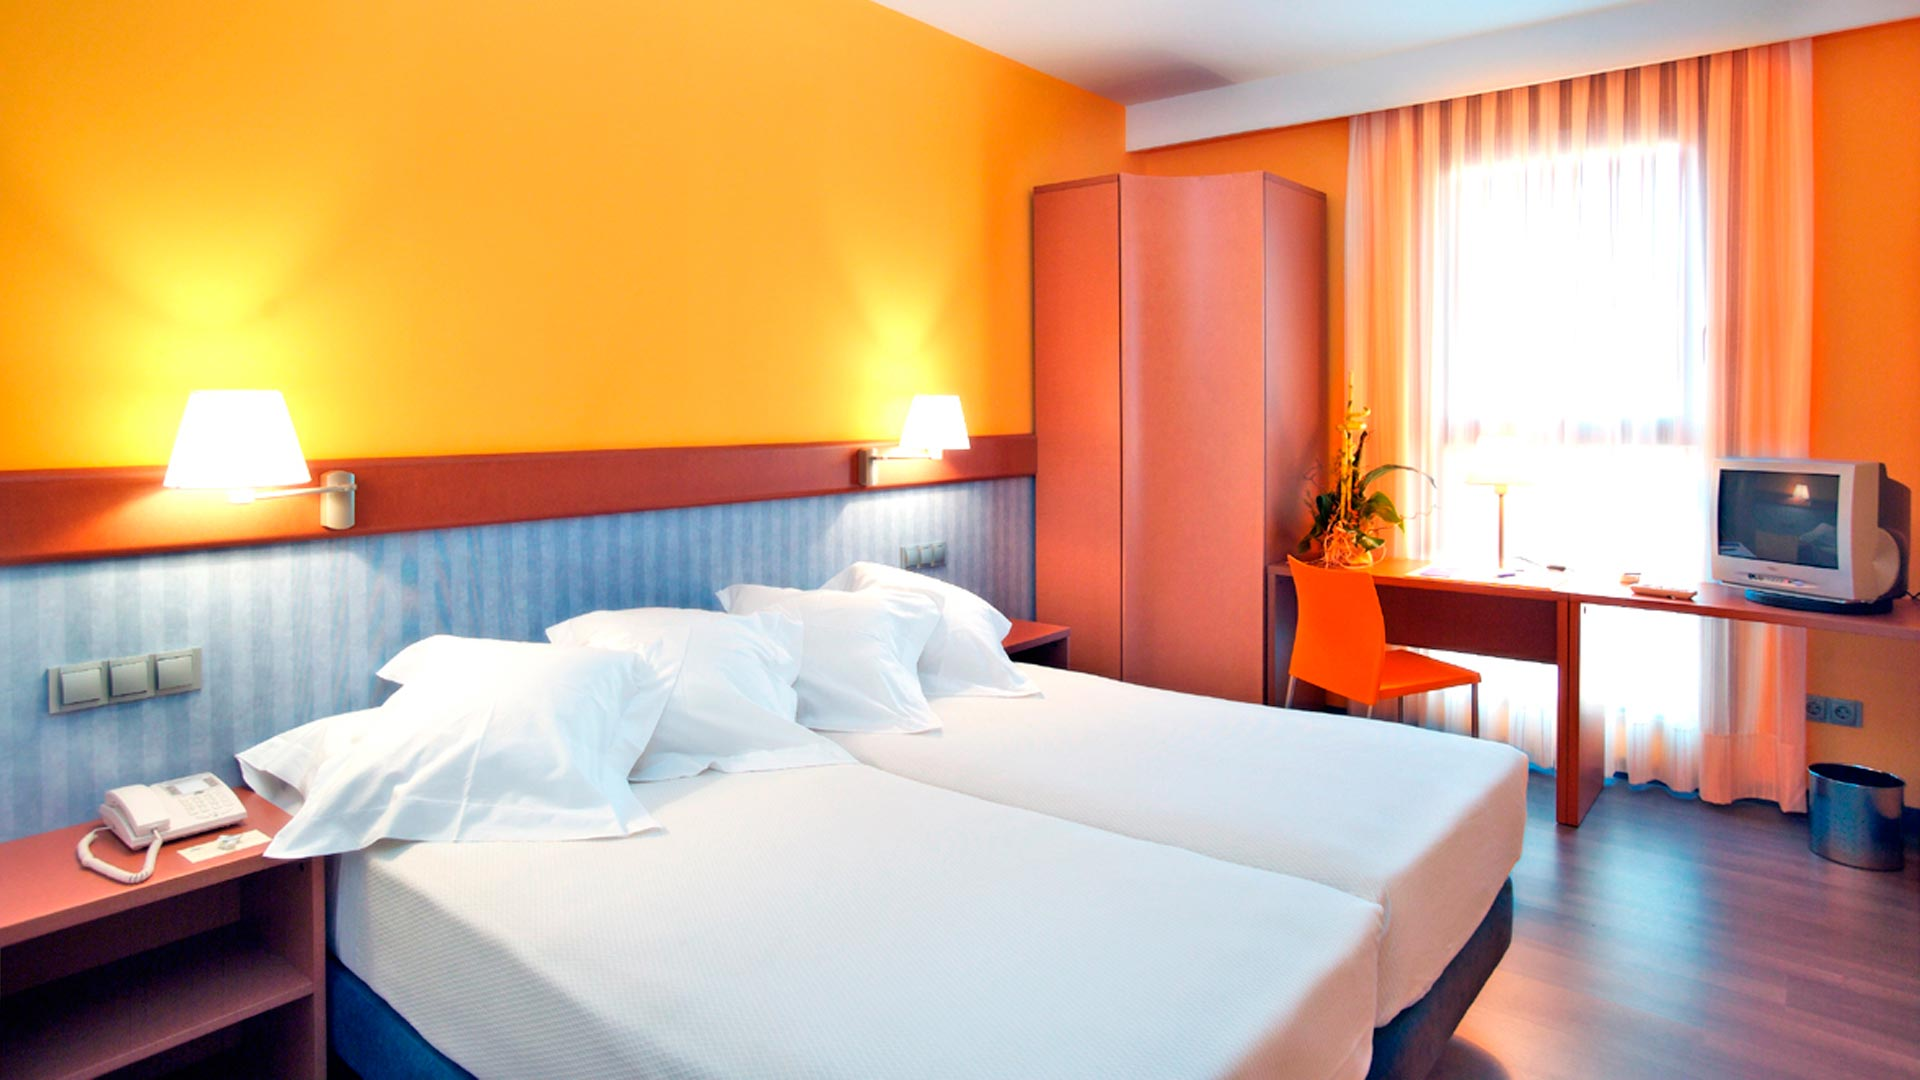 Habitación doble Hotel Murrieta